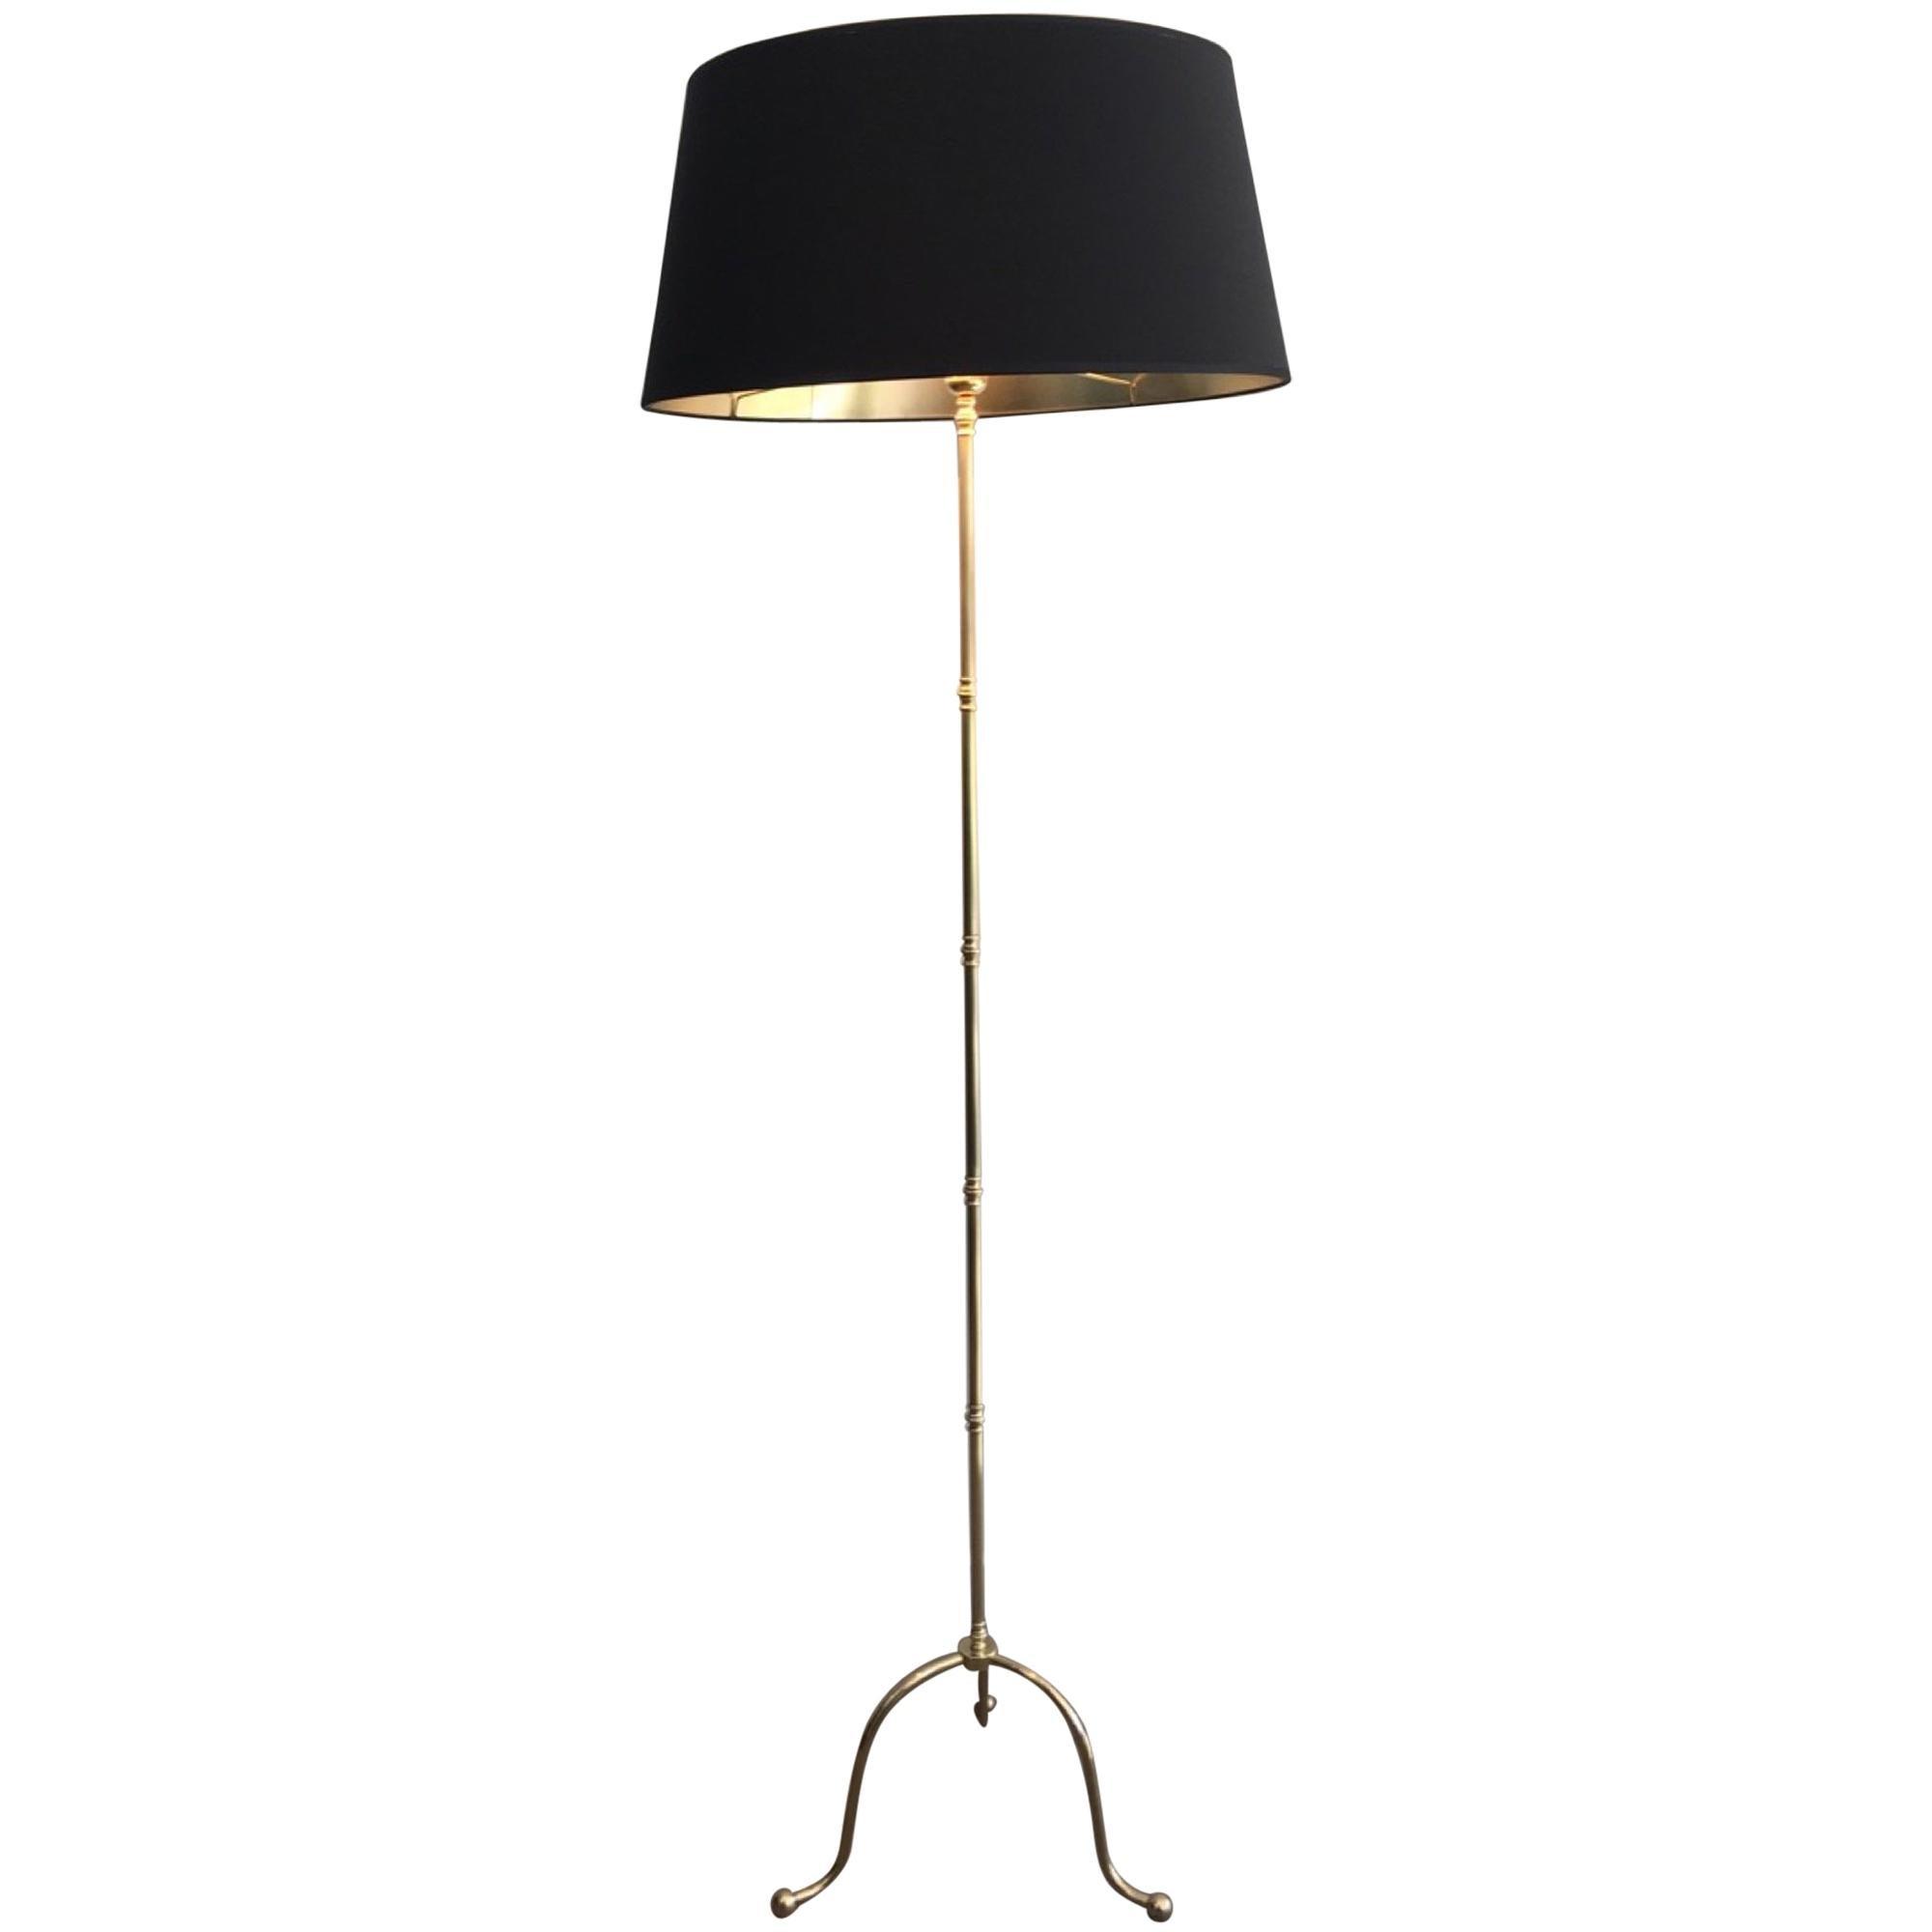 Neoclassical Brass Floor Lamp, French, circa 1940